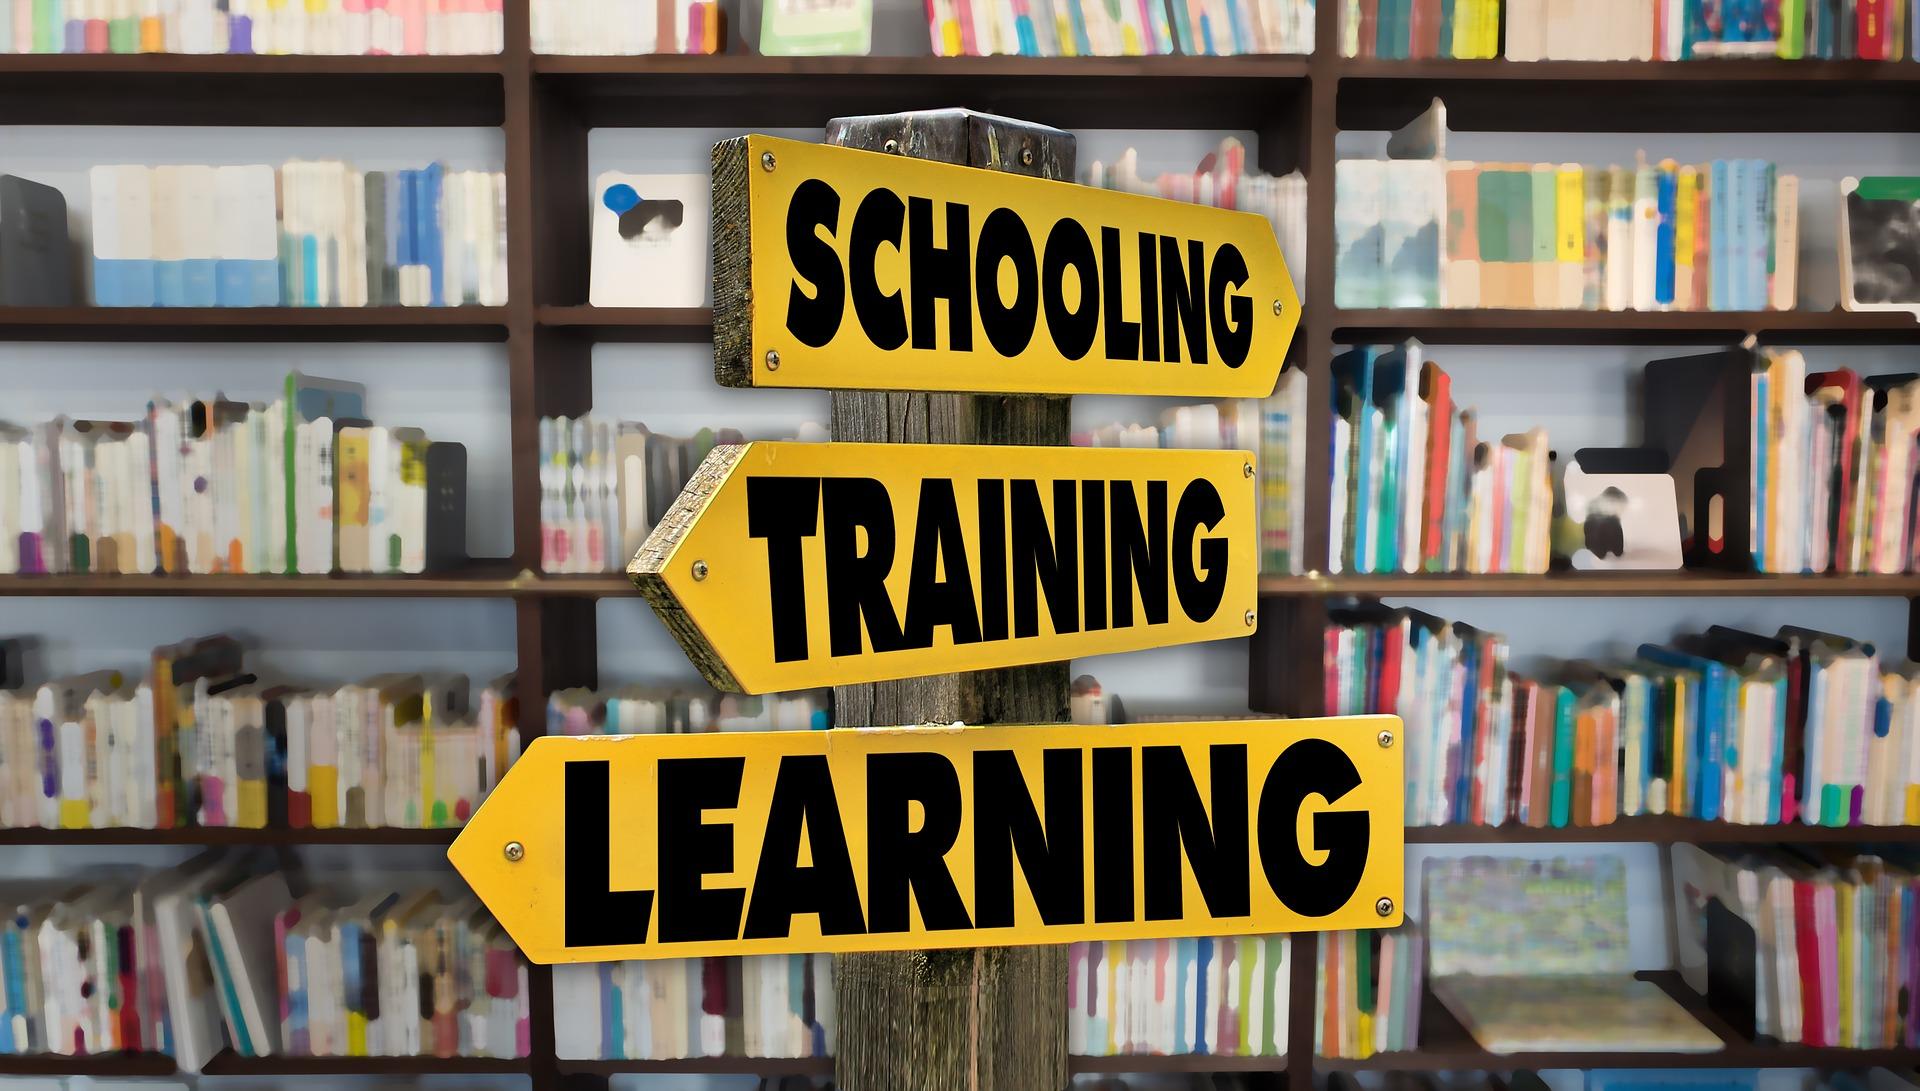 Schooling, Training, Learning